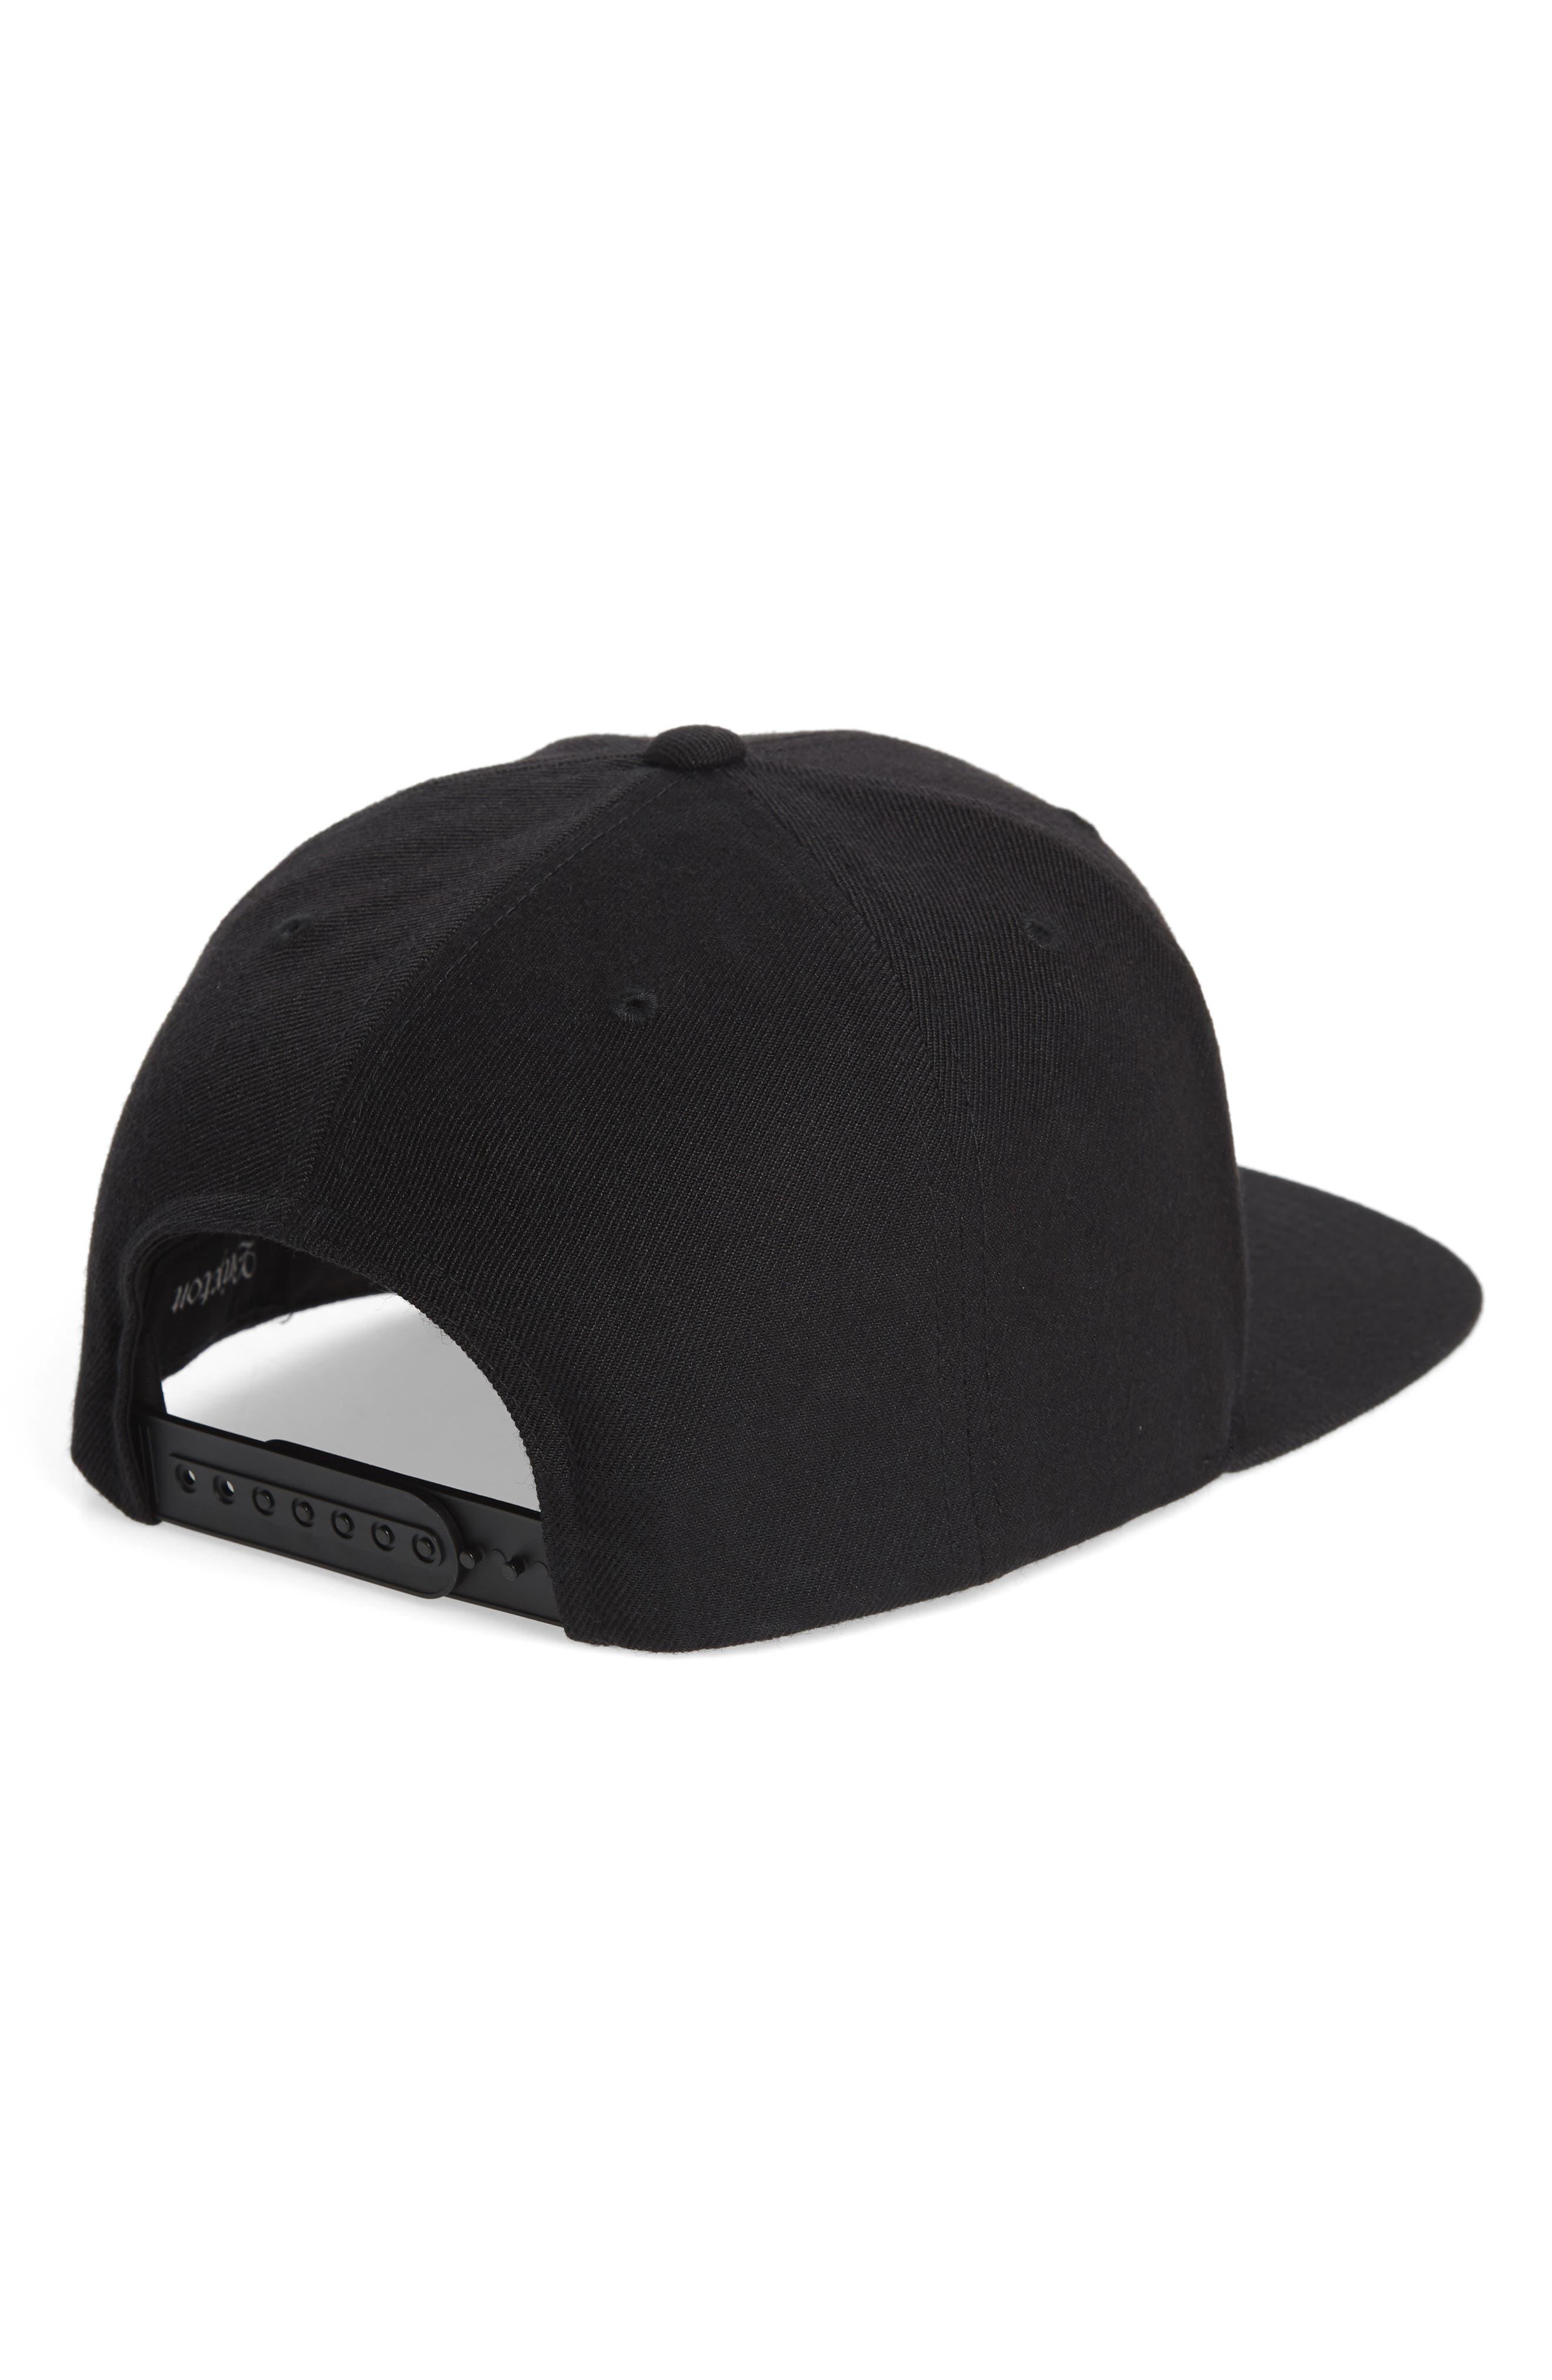 Stowell Snapback Cap,                             Alternate thumbnail 2, color,                             BLACK